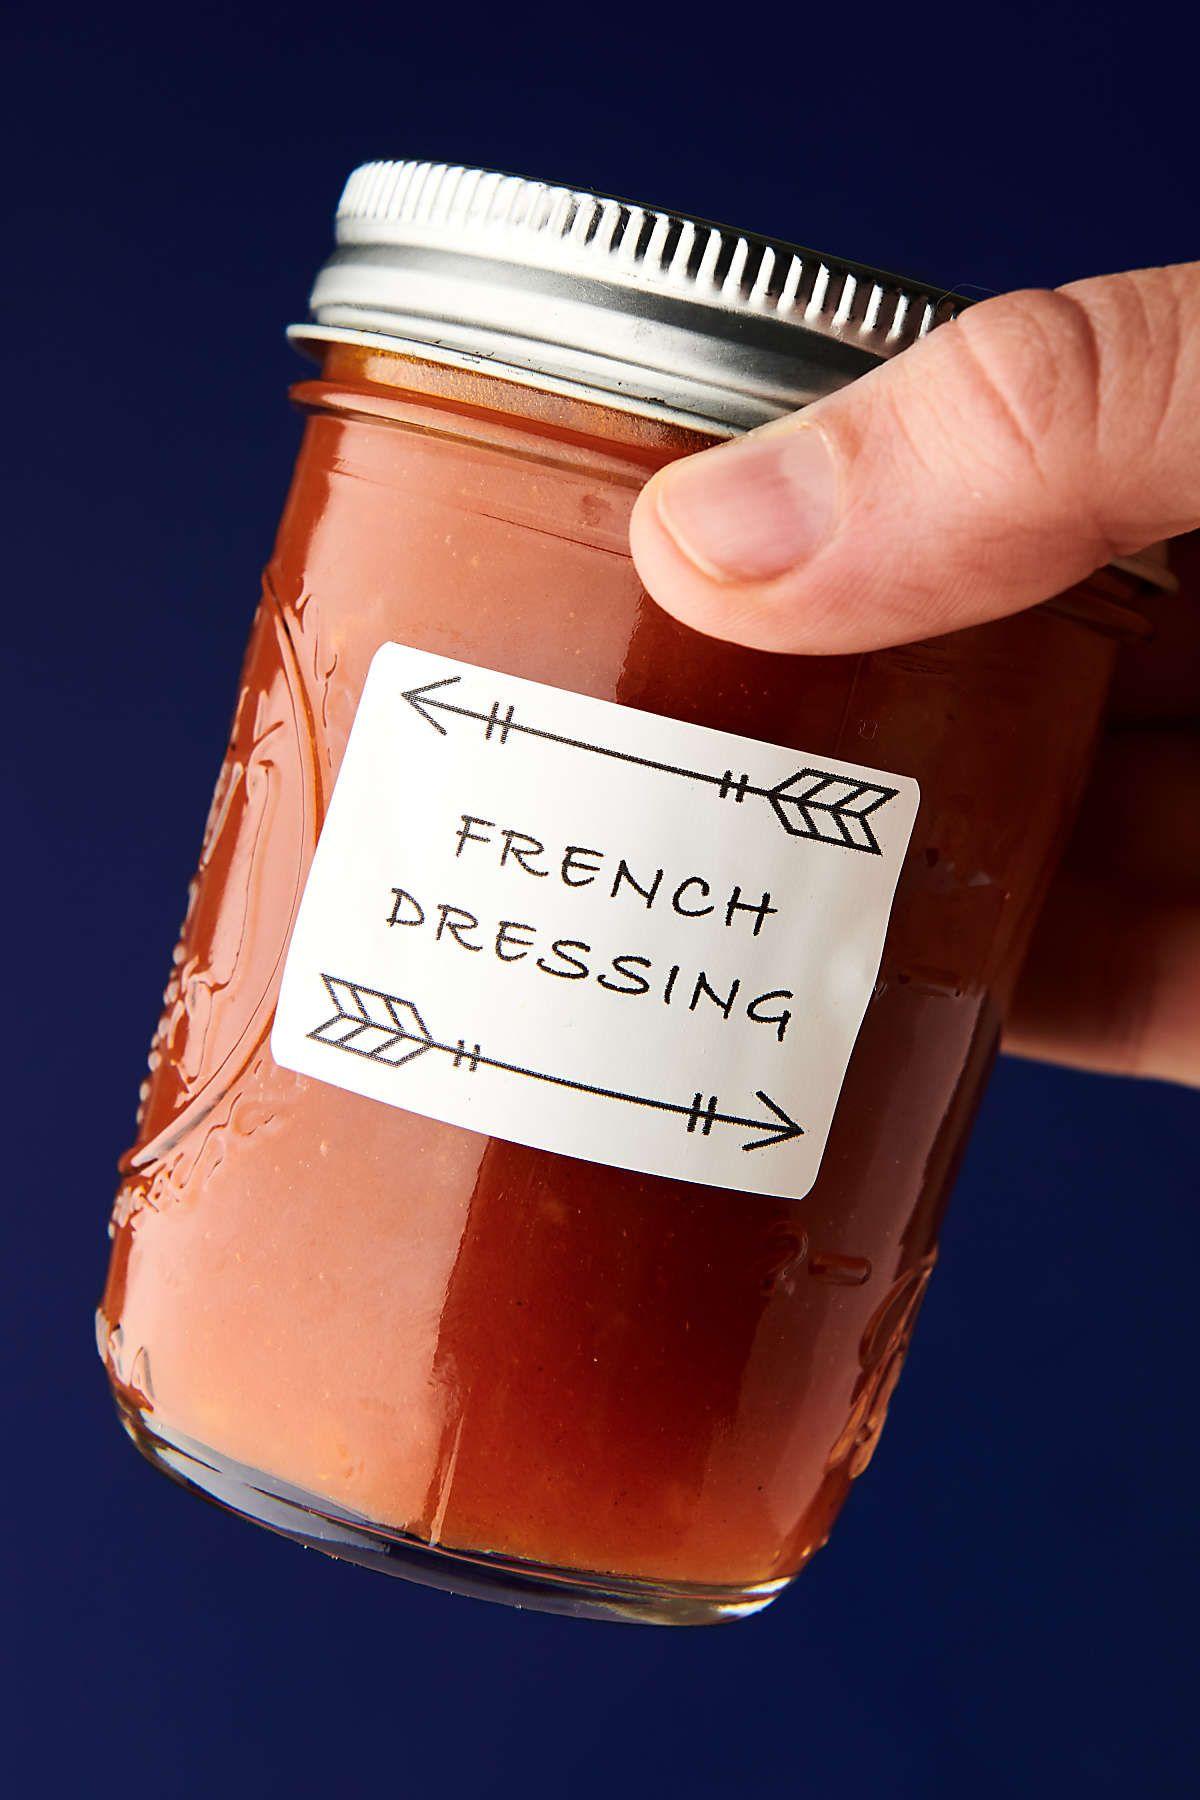 Healthy Homemade French Dressing Recipe Vegan Gluten Free Recipe In 2020 Homemade French Dressing Healthy Dressing Recipes French Dressing